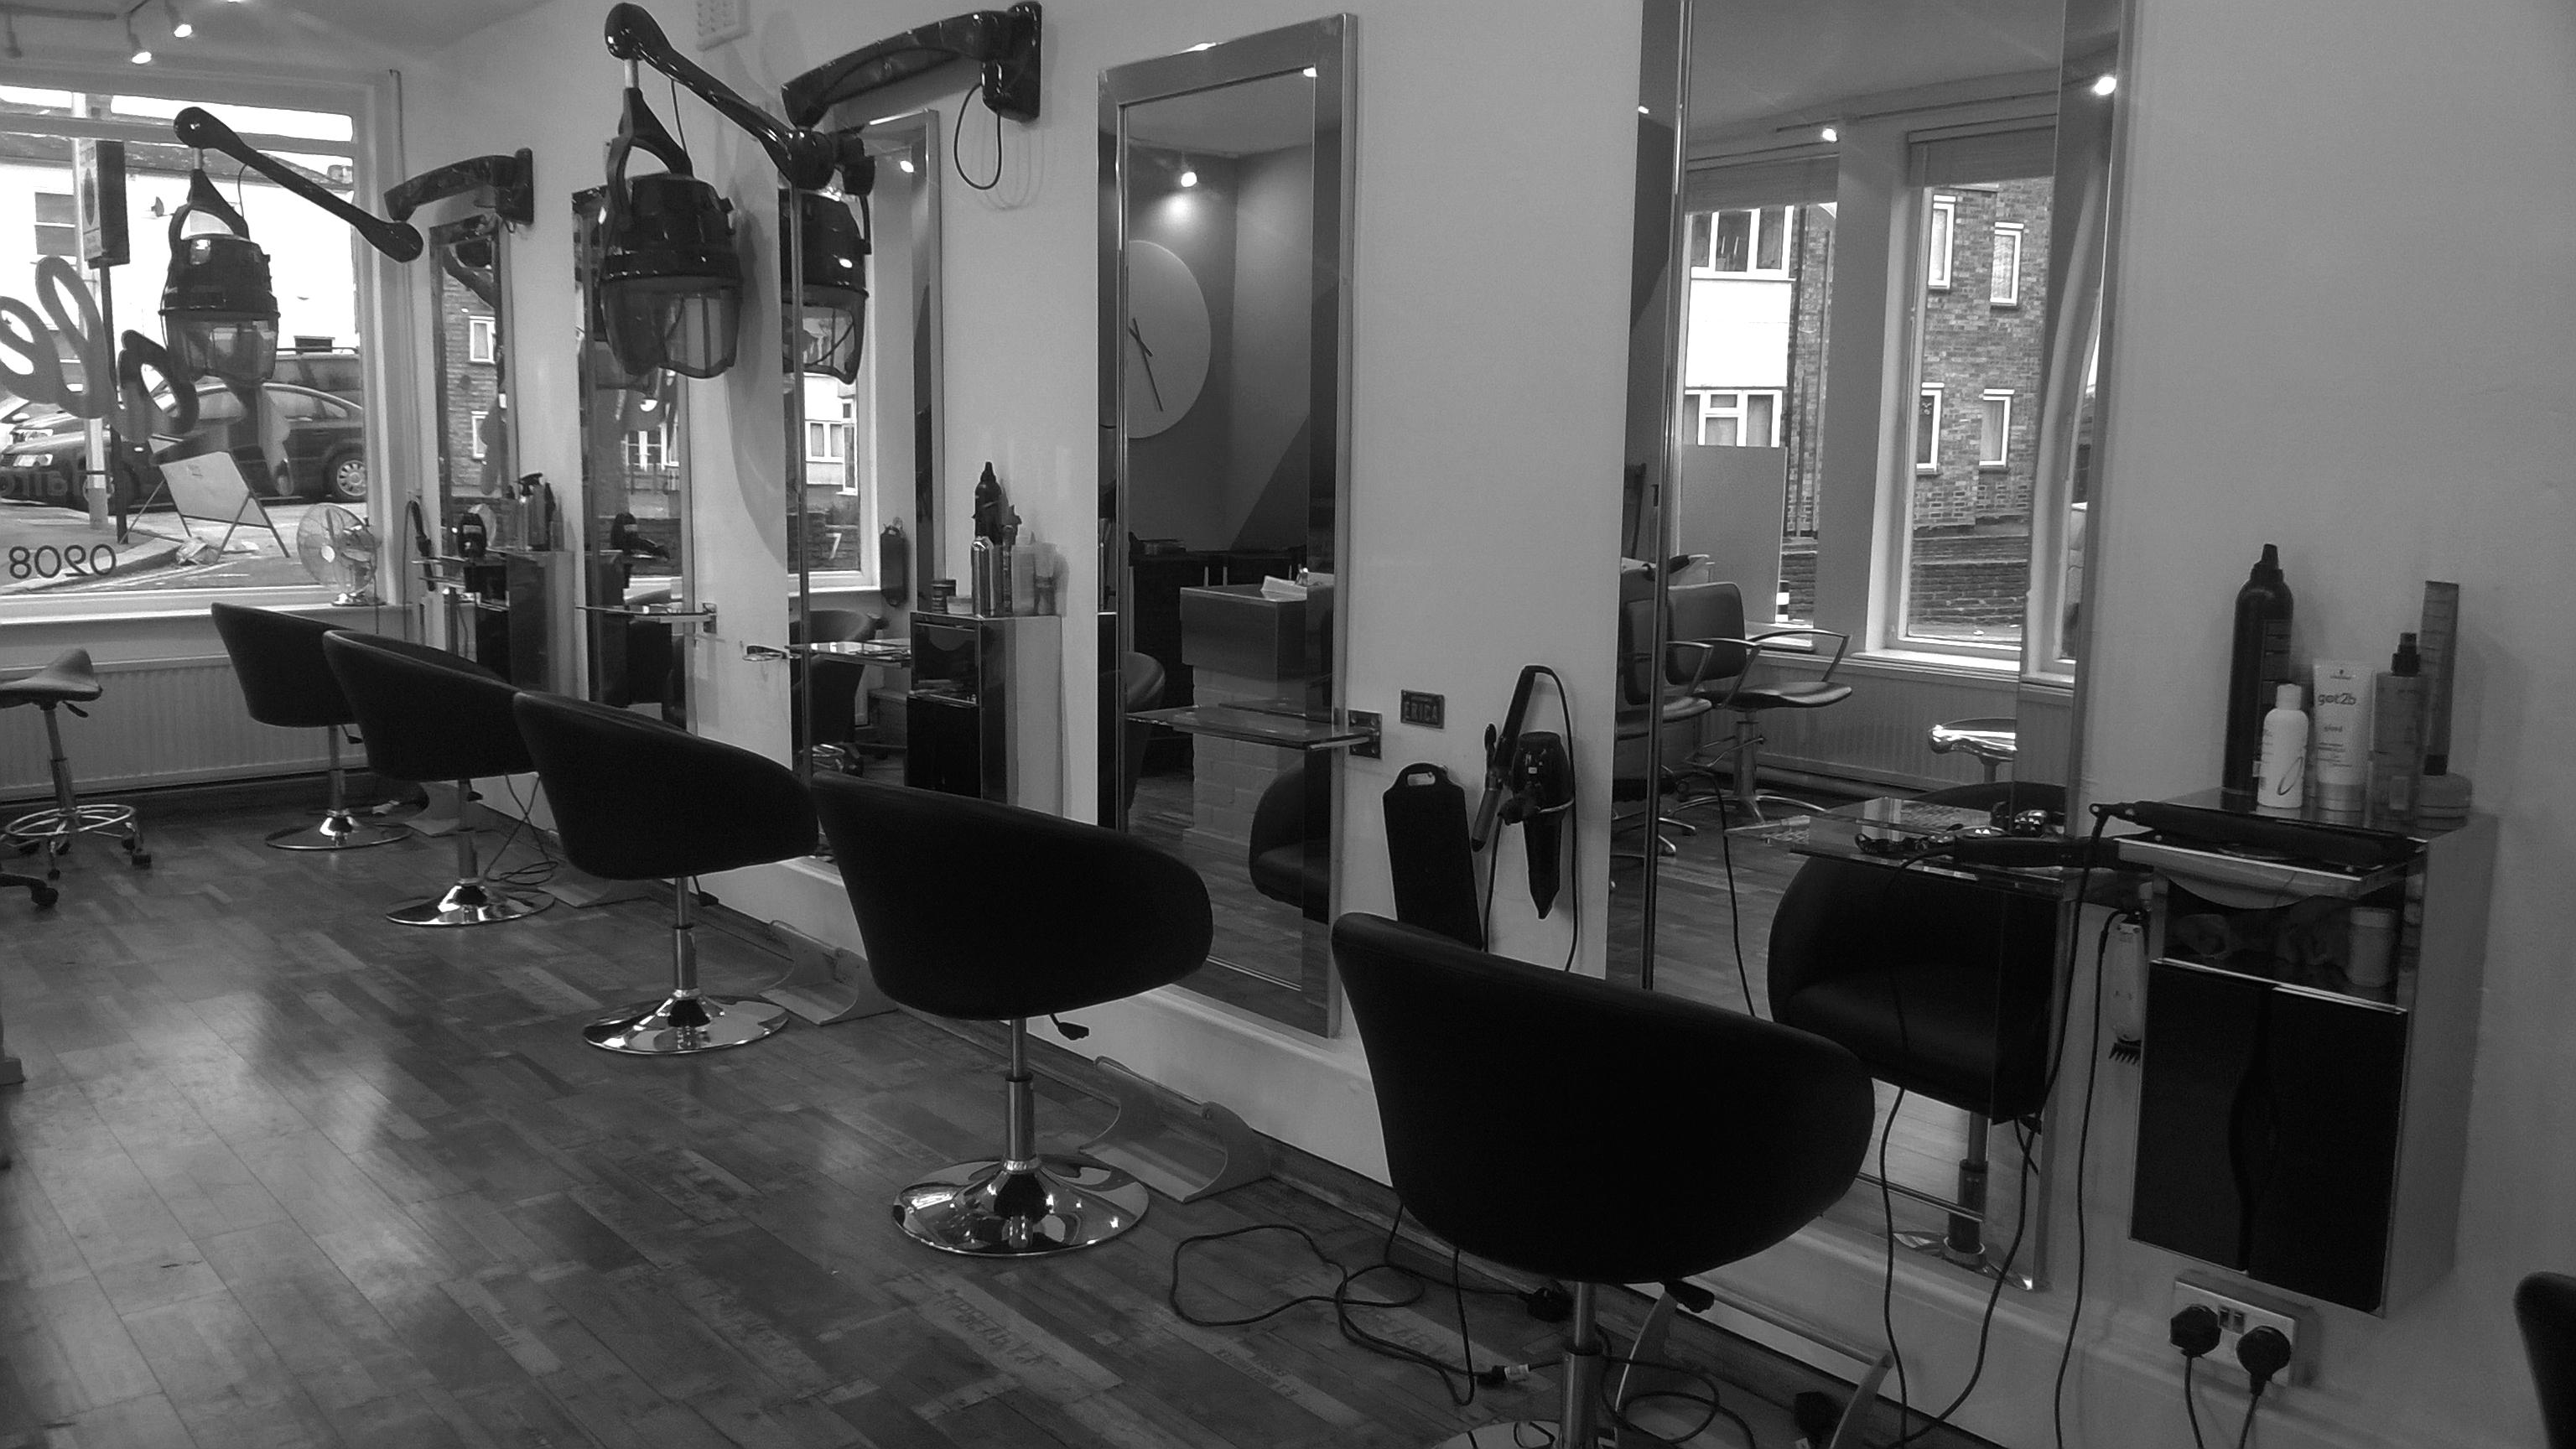 Kaleys Haircutters